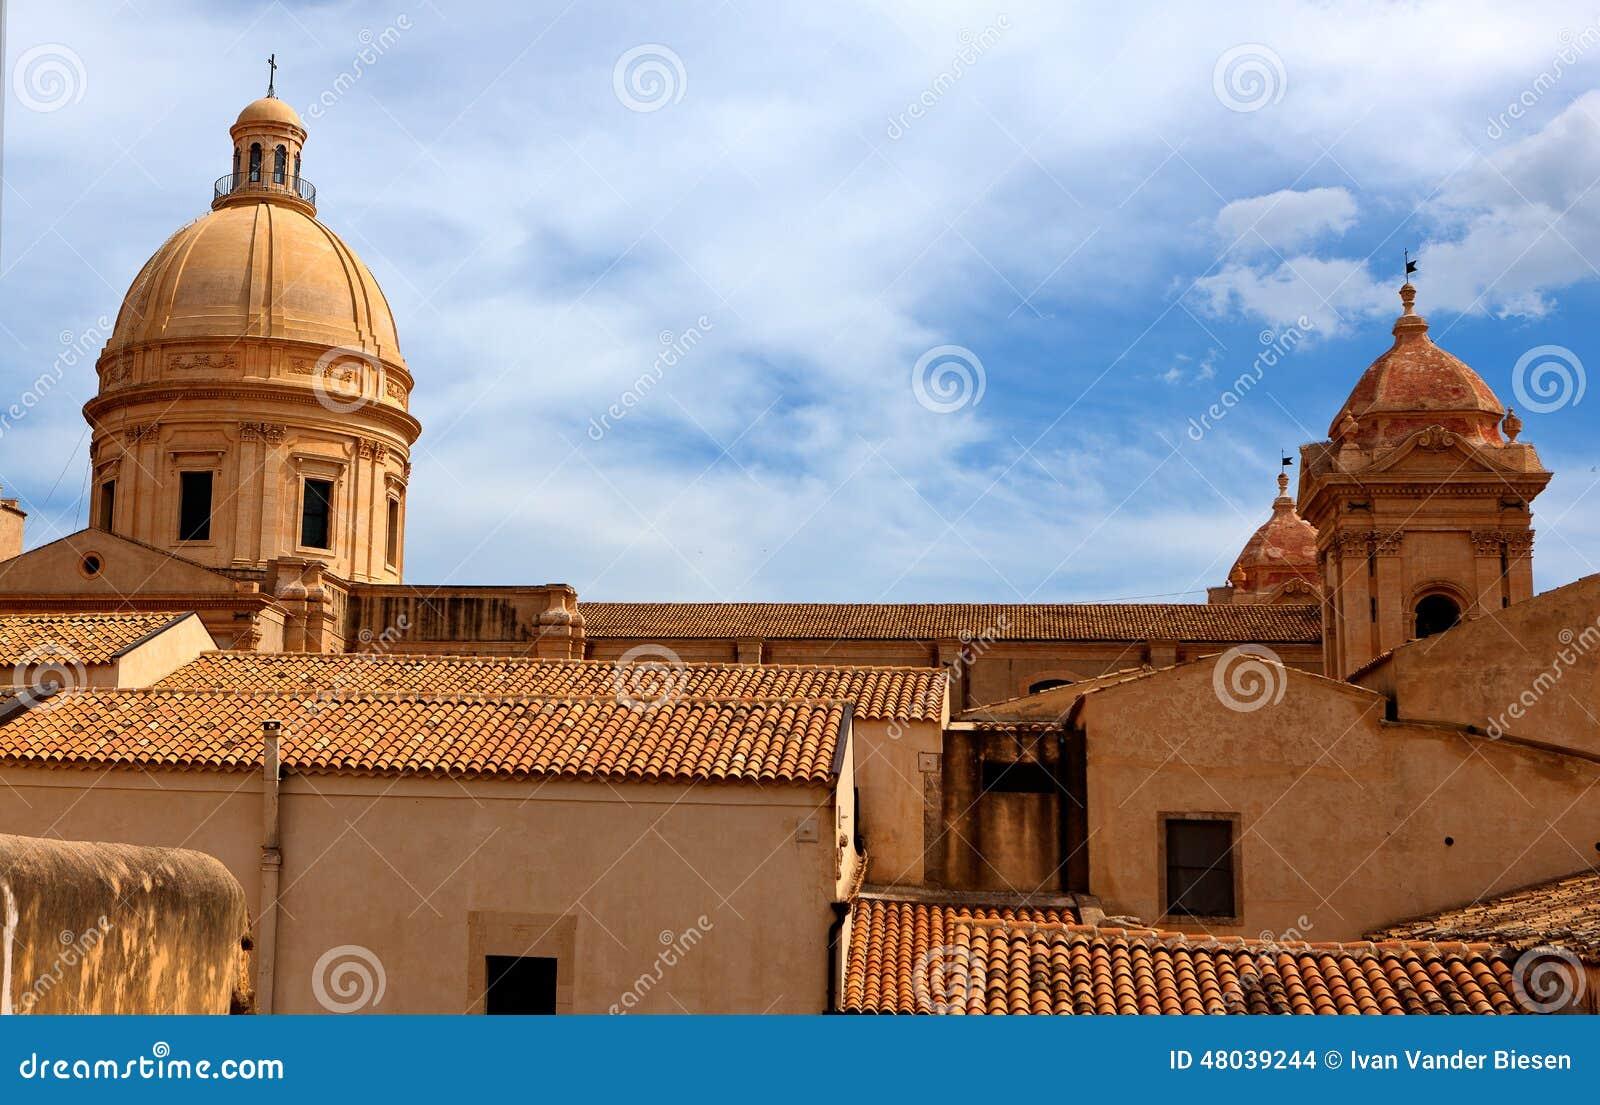 Skyline noto sicily italy stock photo image 48039244 for Baroque italien